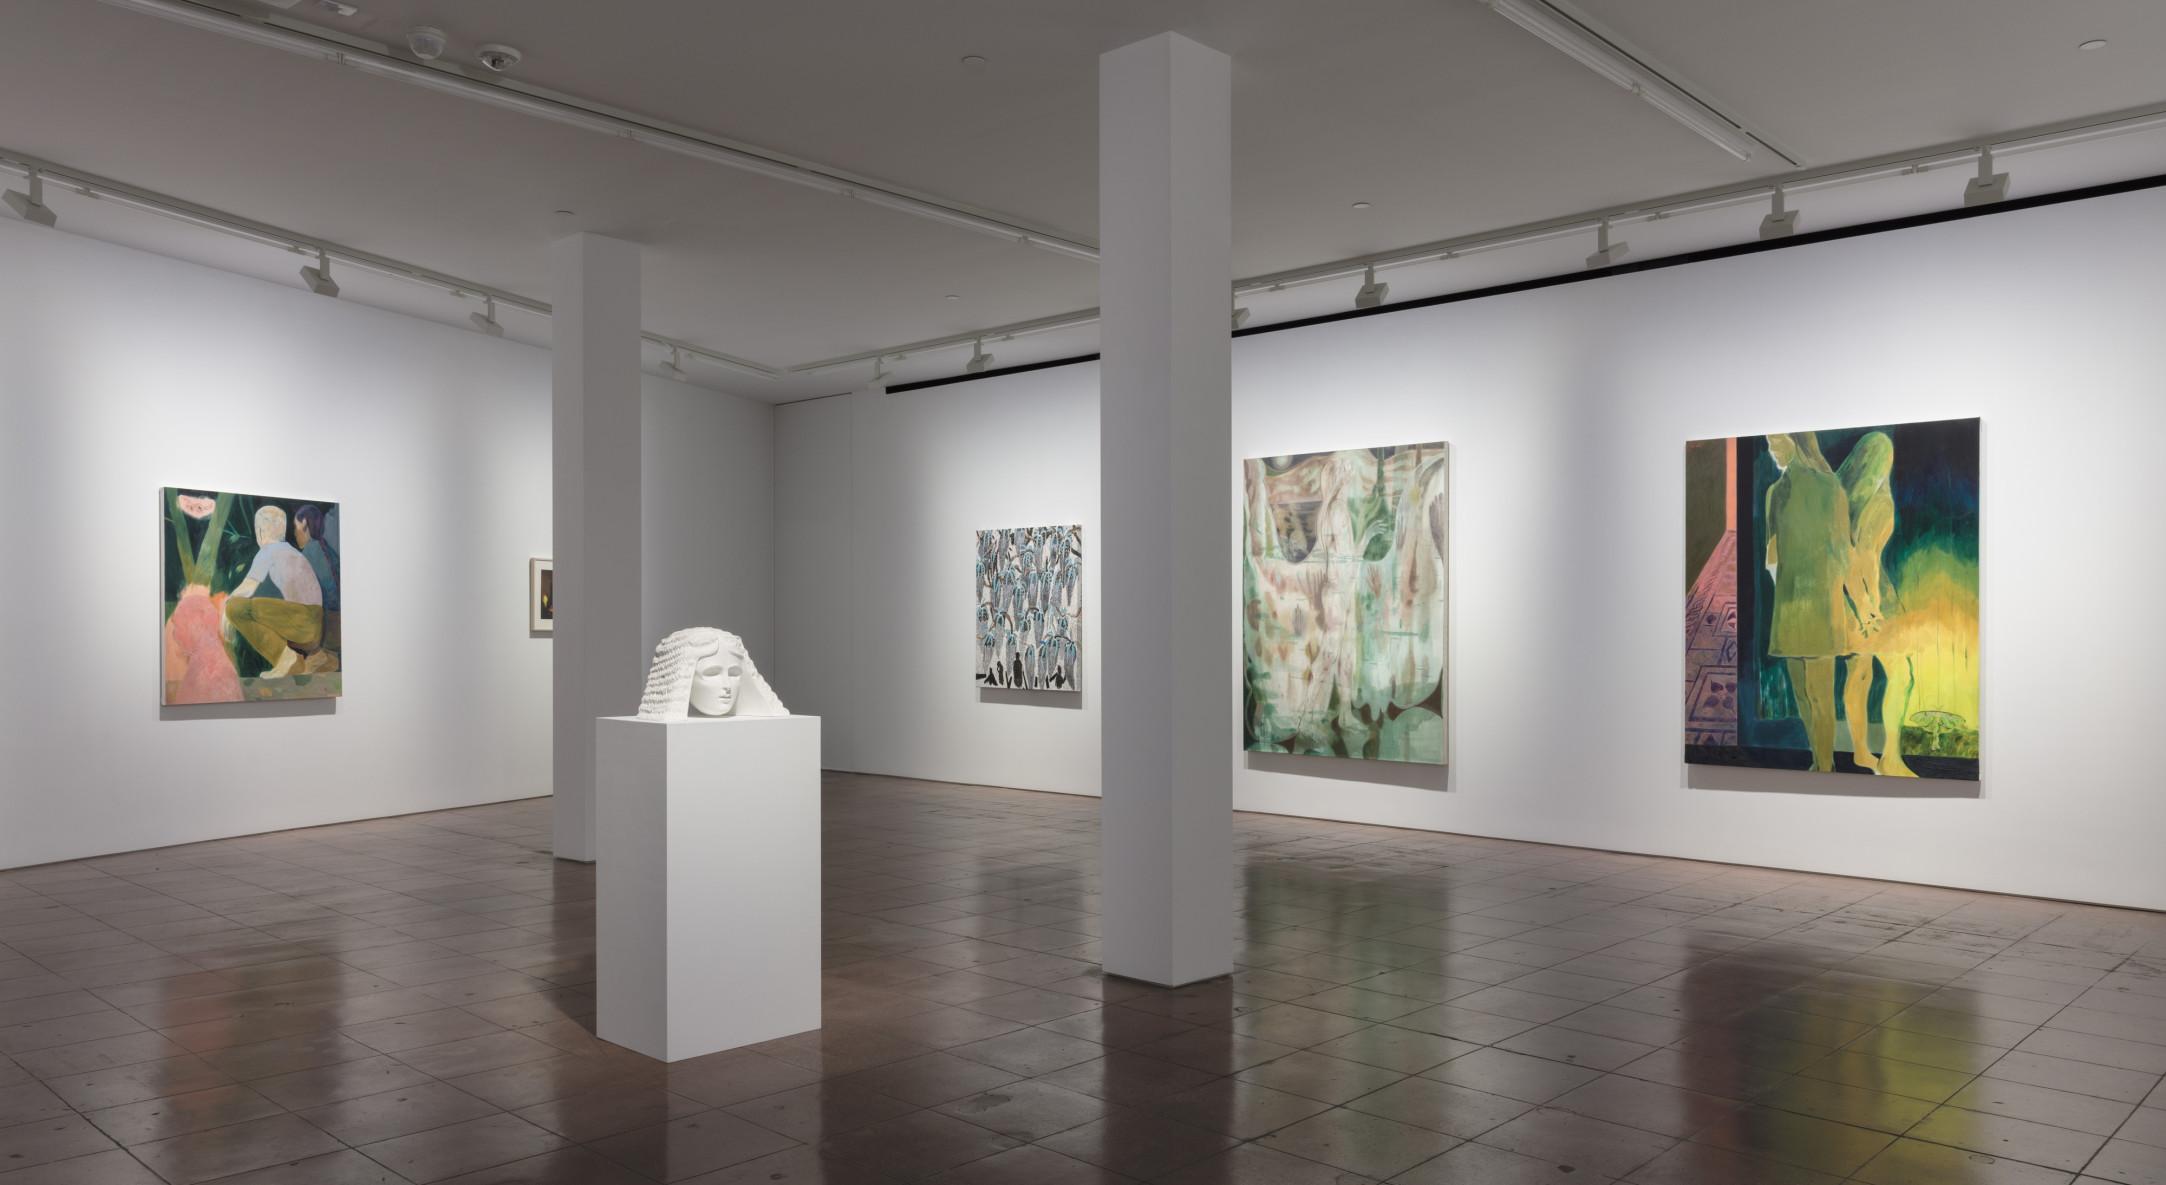 Installation view of The Moon Seemed Lost, Ruby Onyinyechi Amanze, Omar Ba, Anthony Cudahy, TM Davy, Rotimi Fani-Kayode, Sarah Peters, and Maja Ruznic, at Hales New York